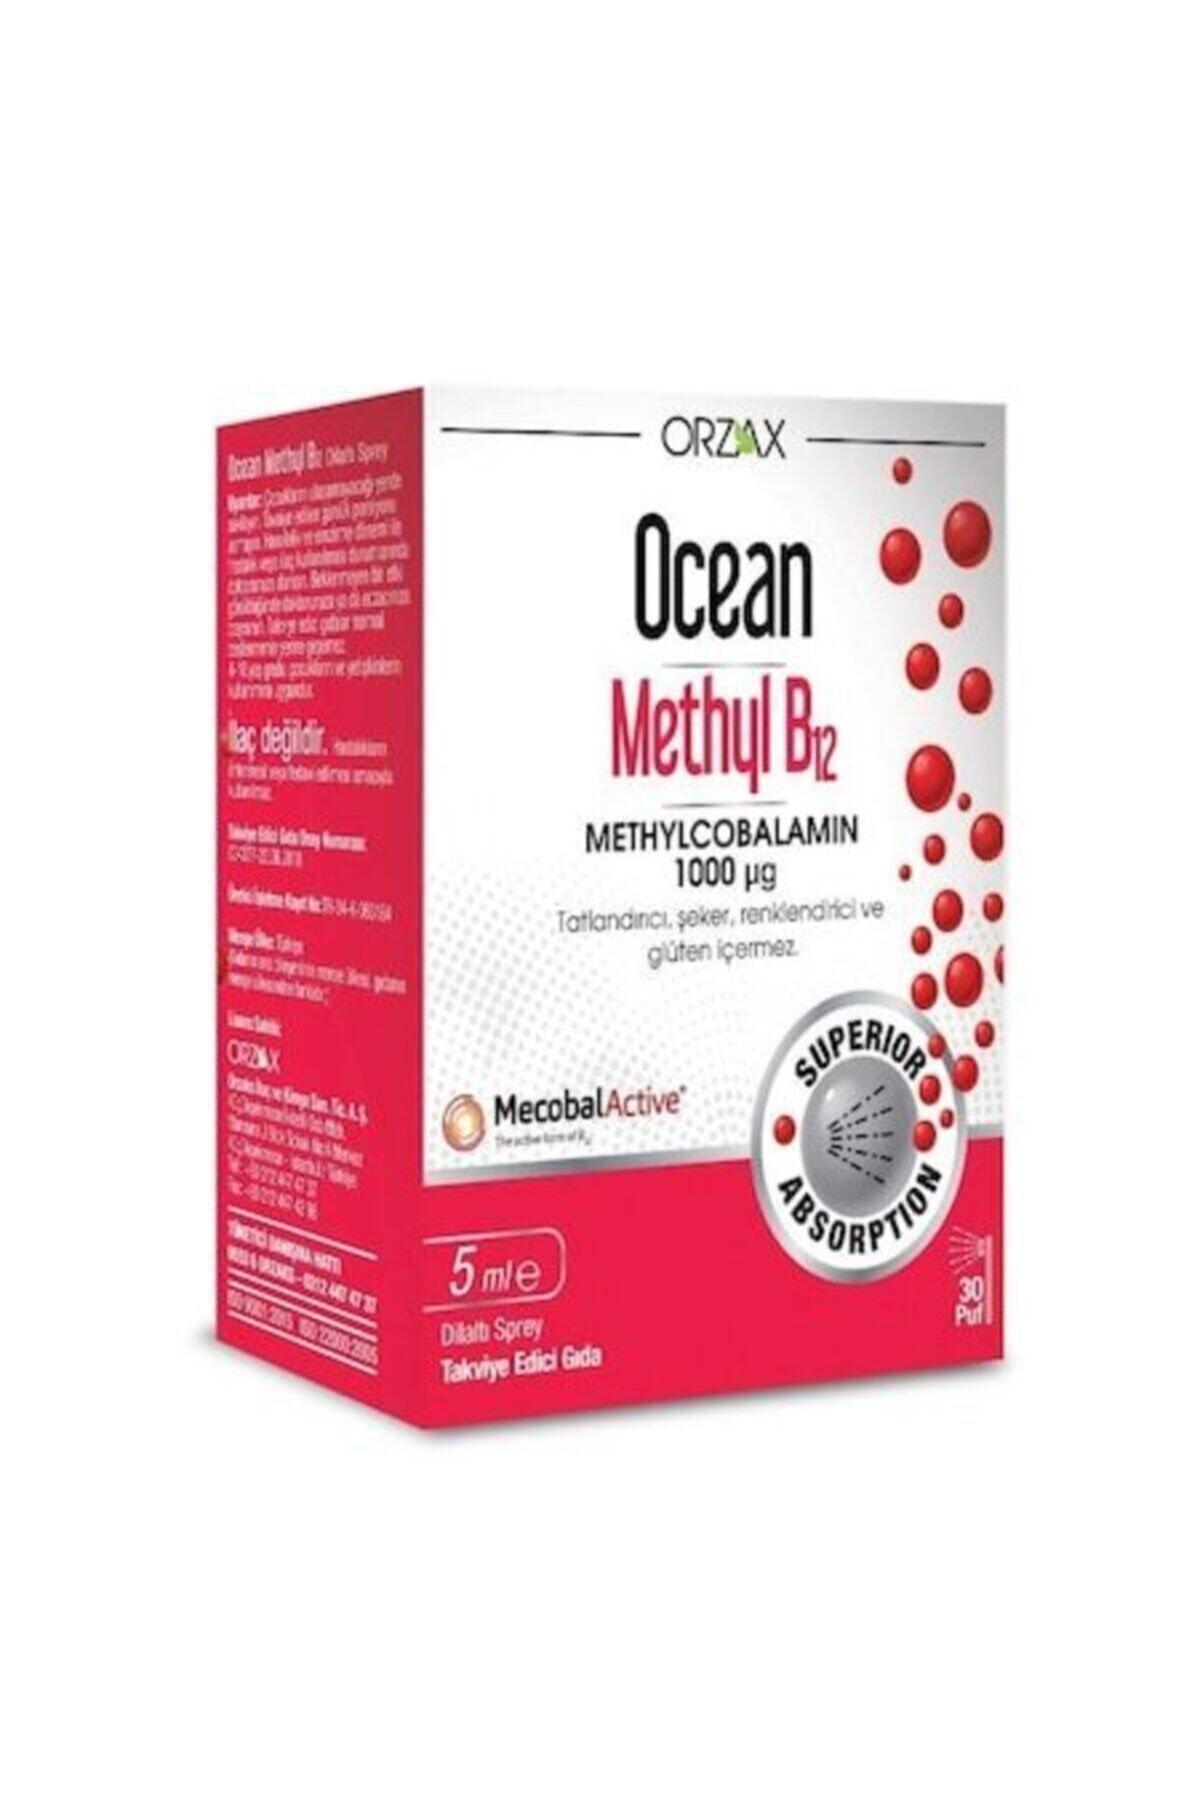 Ocean Orzax Methyl B12 Sprey 1000 Mcg 5ml 1